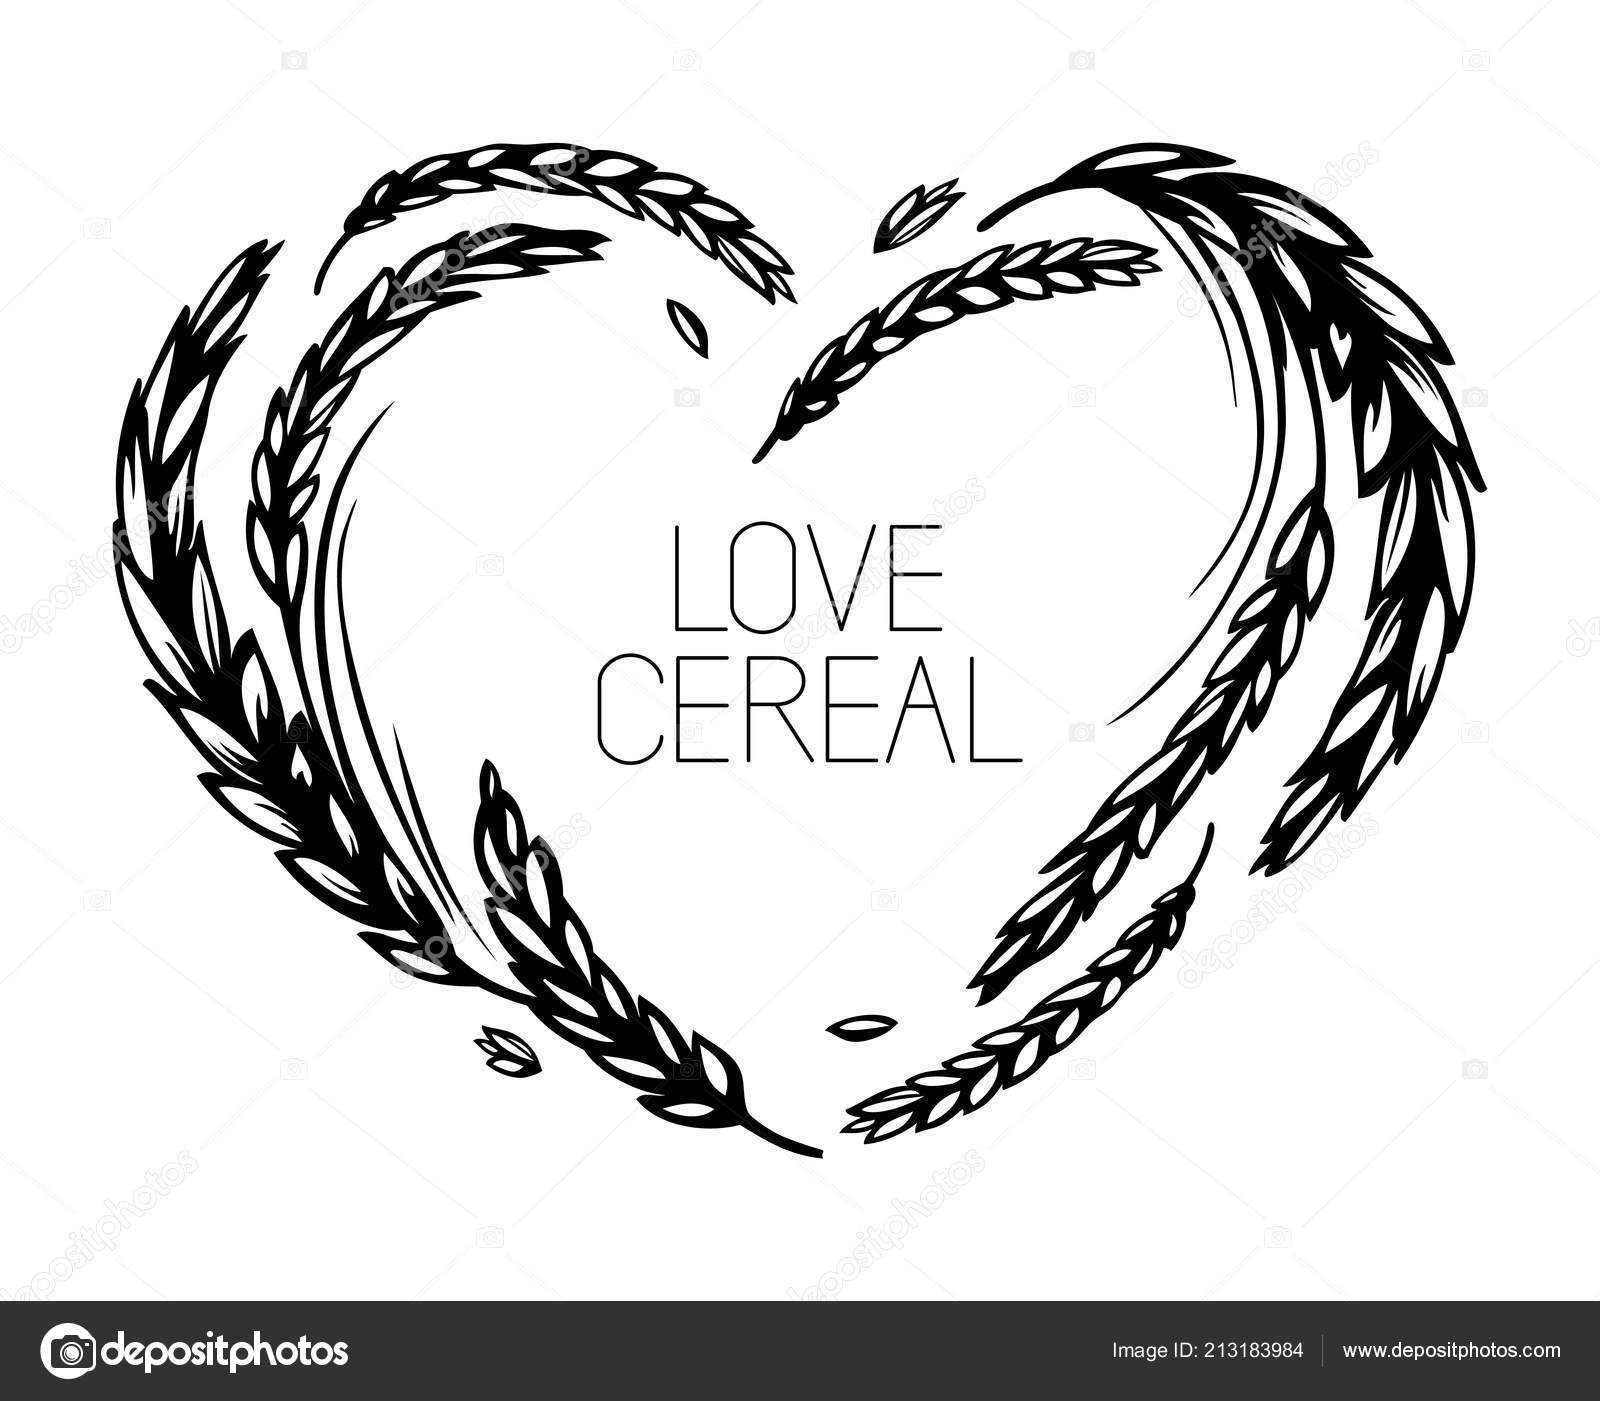 Wheat Heart Frame Wreath White Background Love Cereal Black White ...